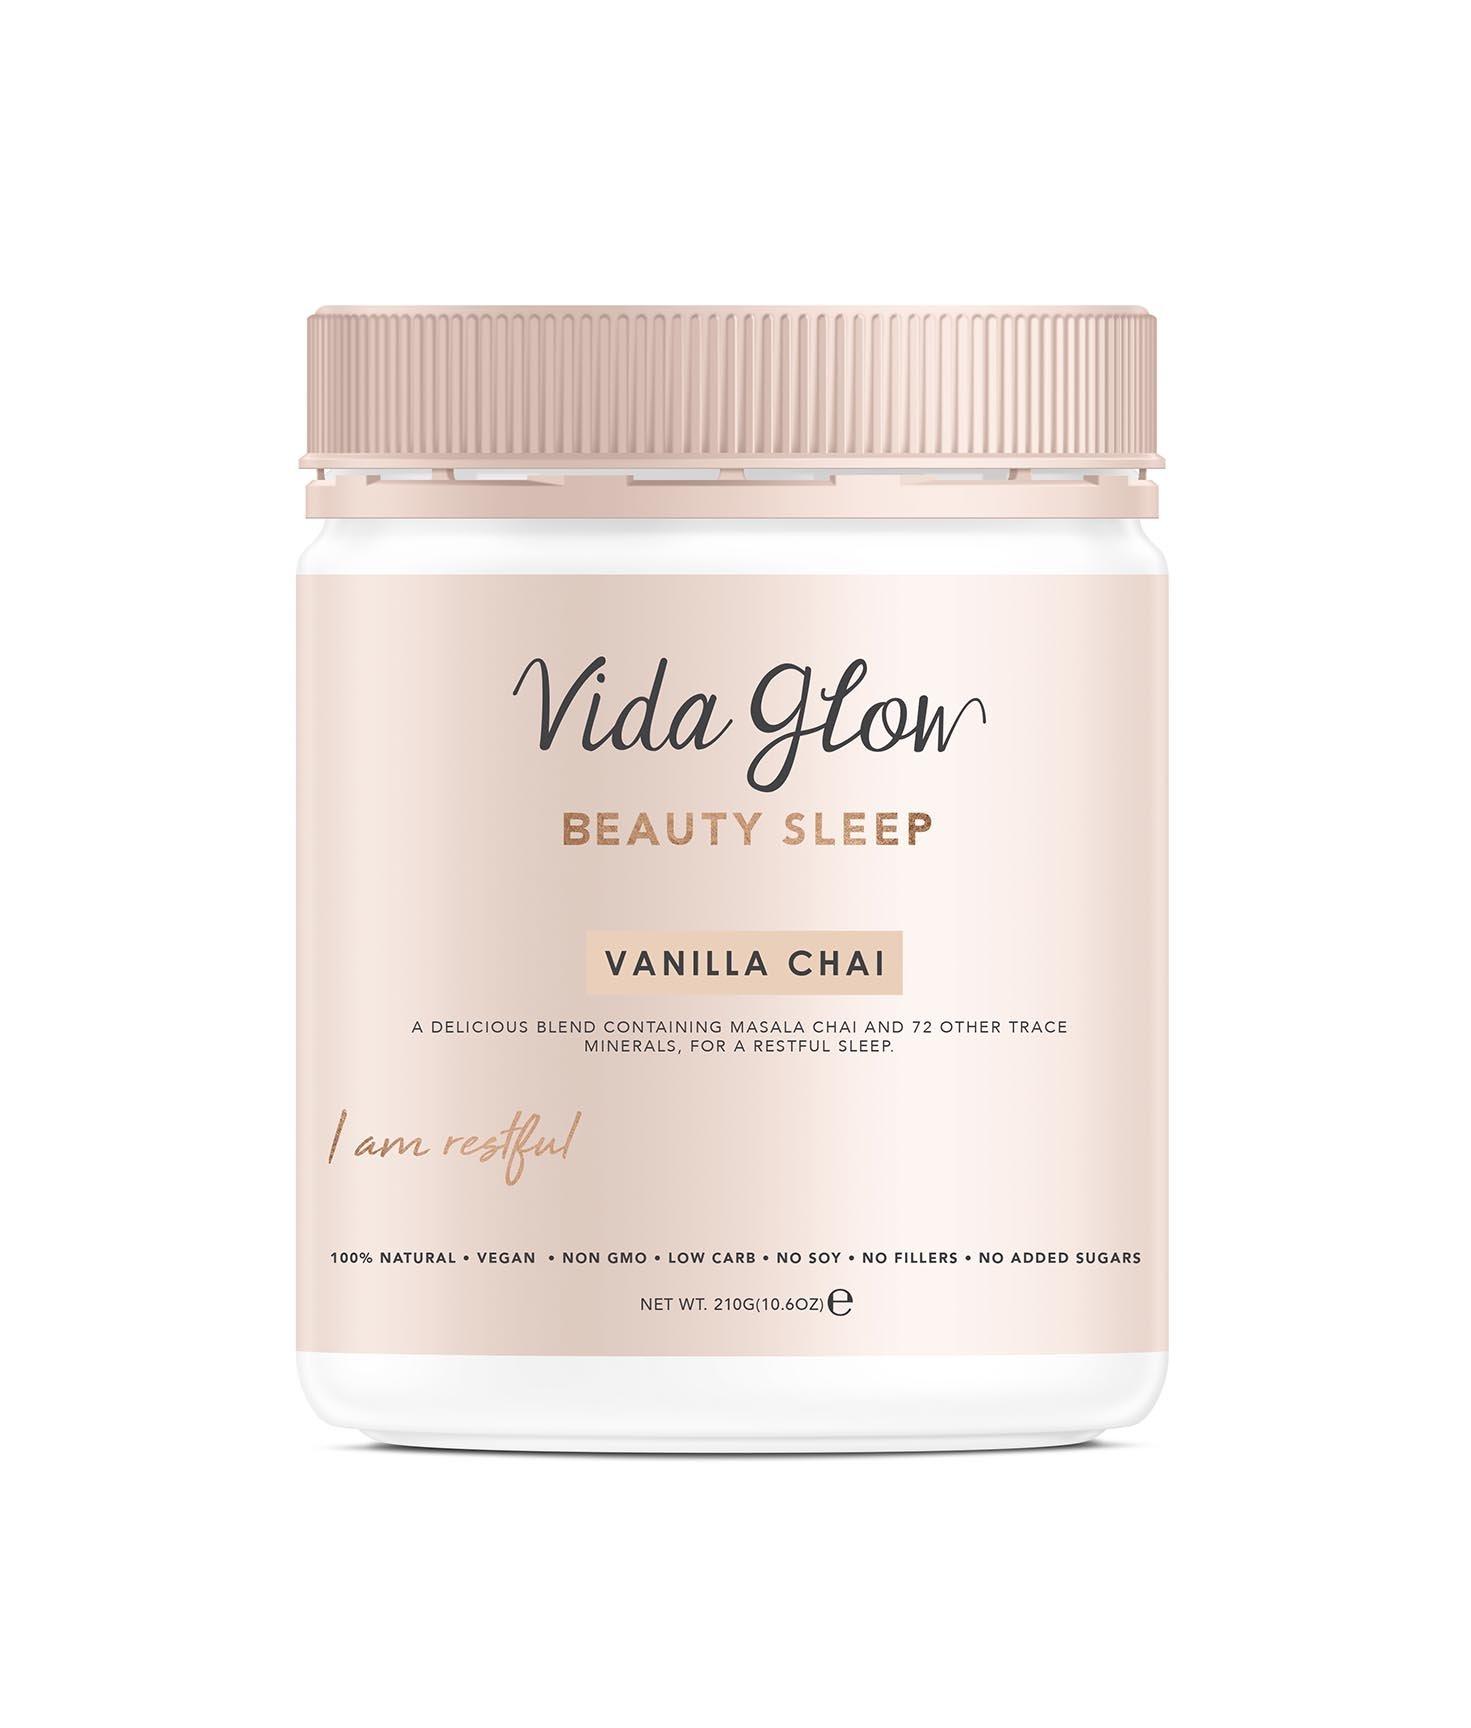 Vida Glow Beauty Sleep Chai